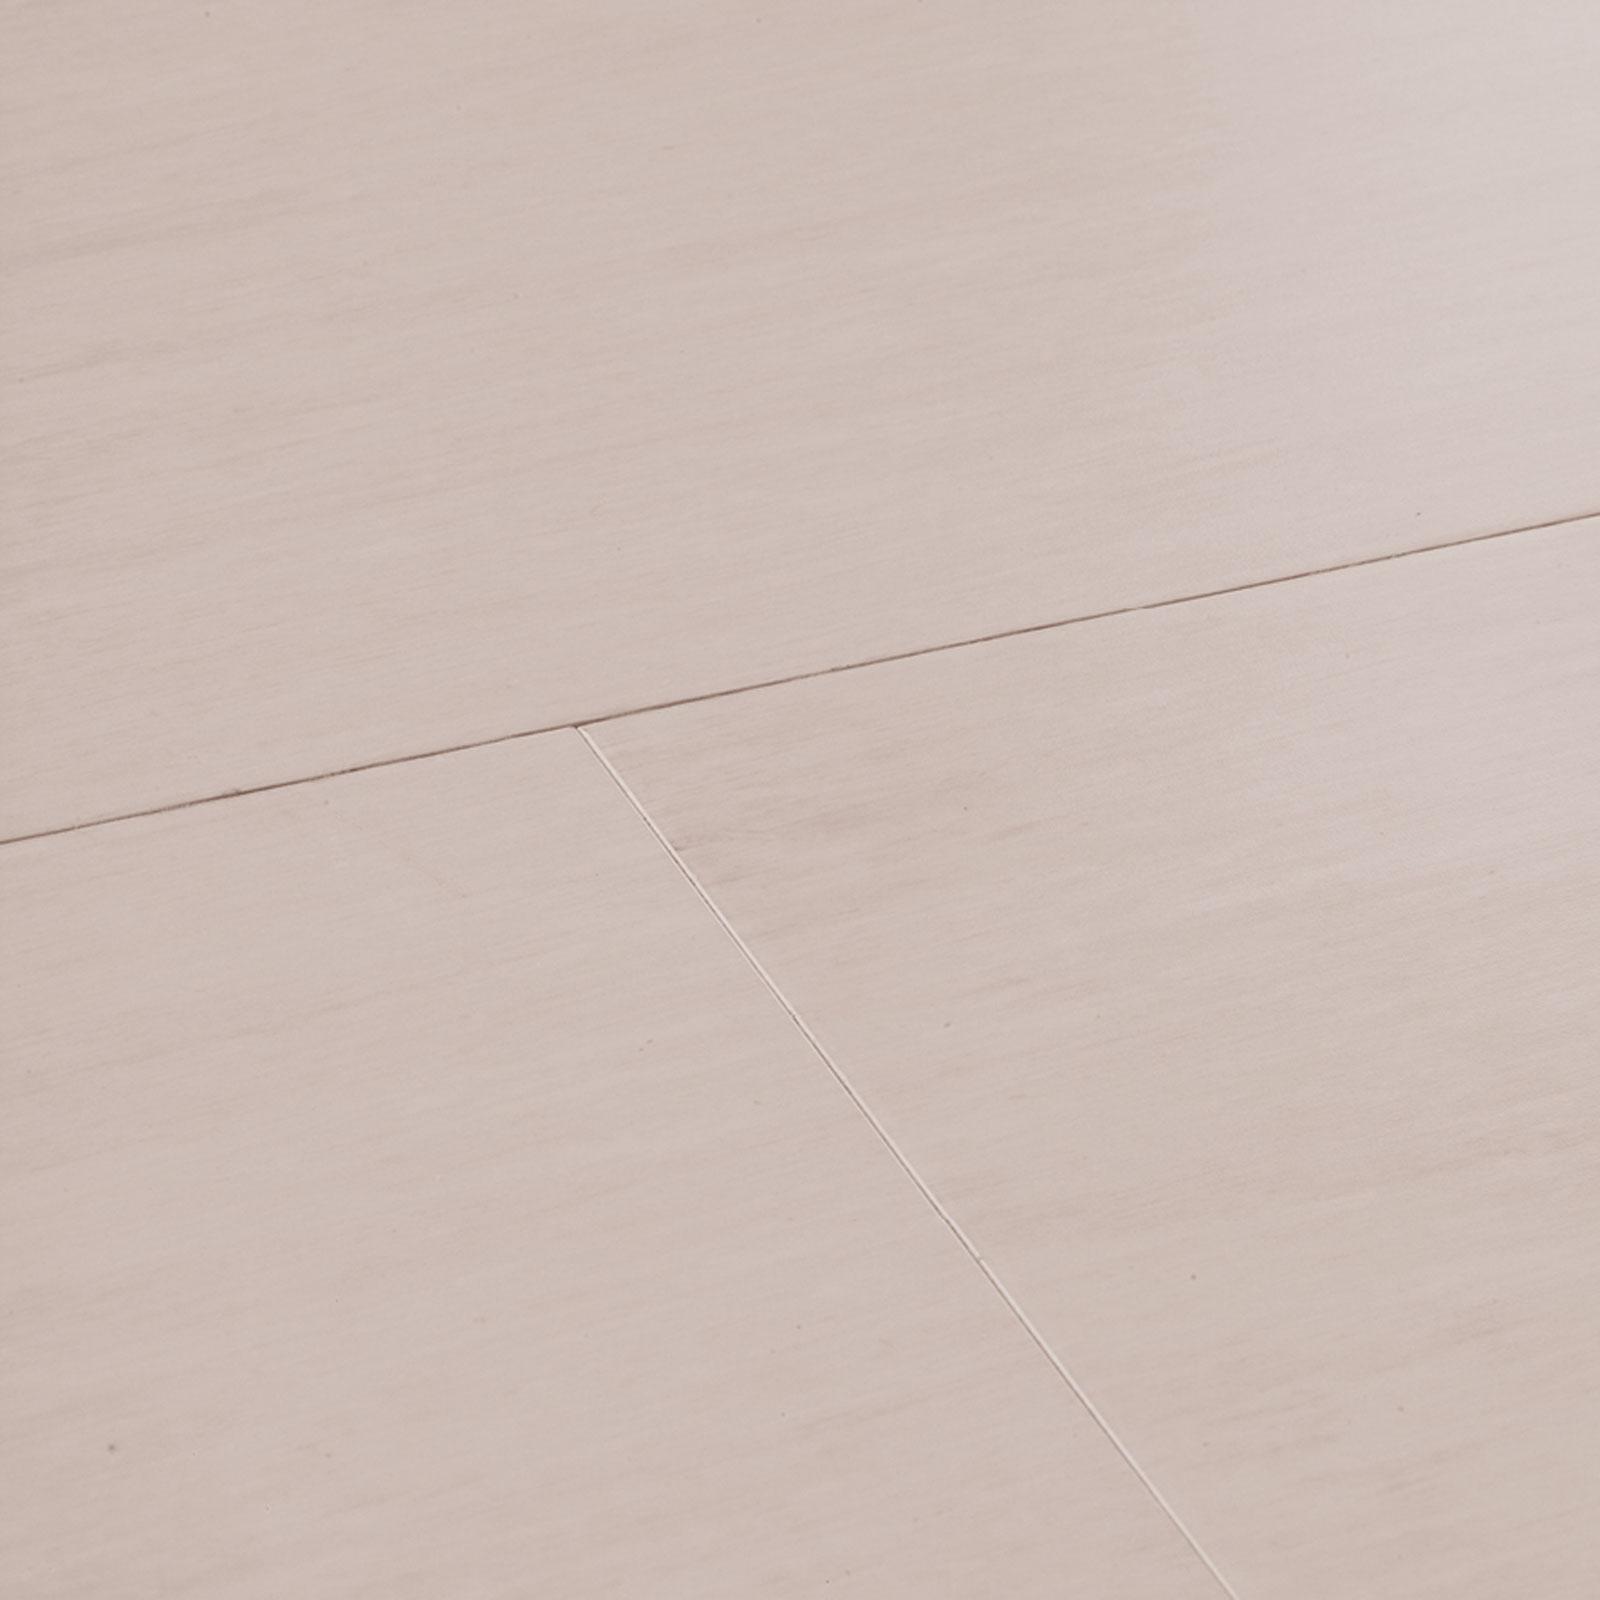 swatch-cropped-oxwich-whitewash-strand-bamboo-1600.jpg